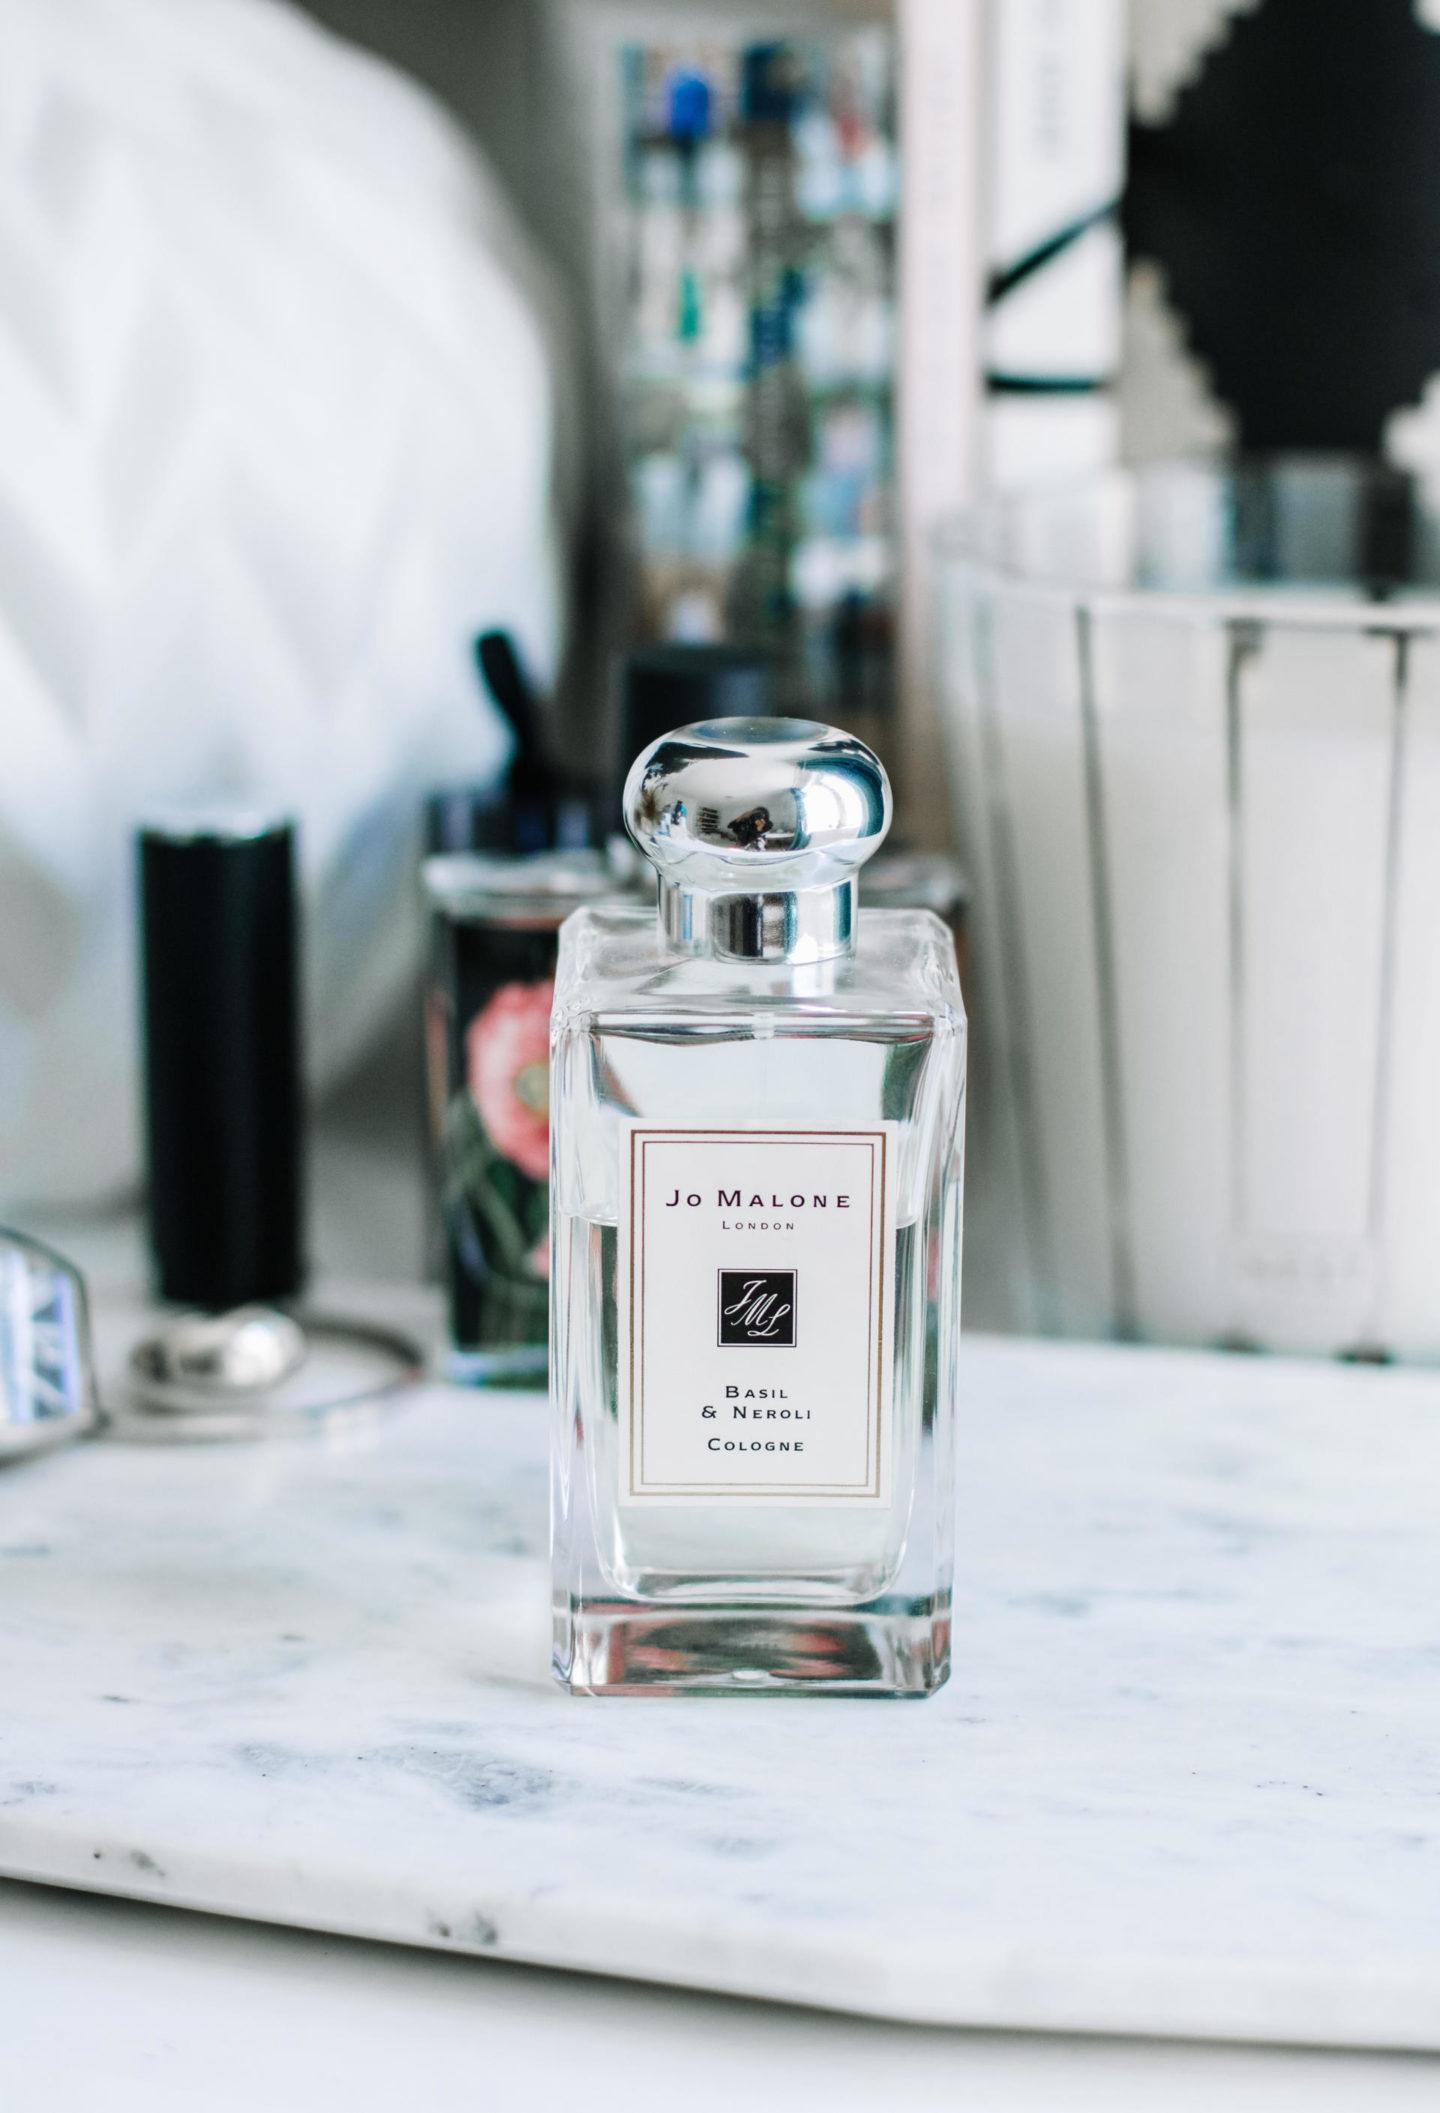 Style Domination Favourite Spring 2019 perfumes Nest Fragrances Wild Poppy Penhaligon's Violetta Armani Beauty Is Passione Jo Malone Basil And Neroli